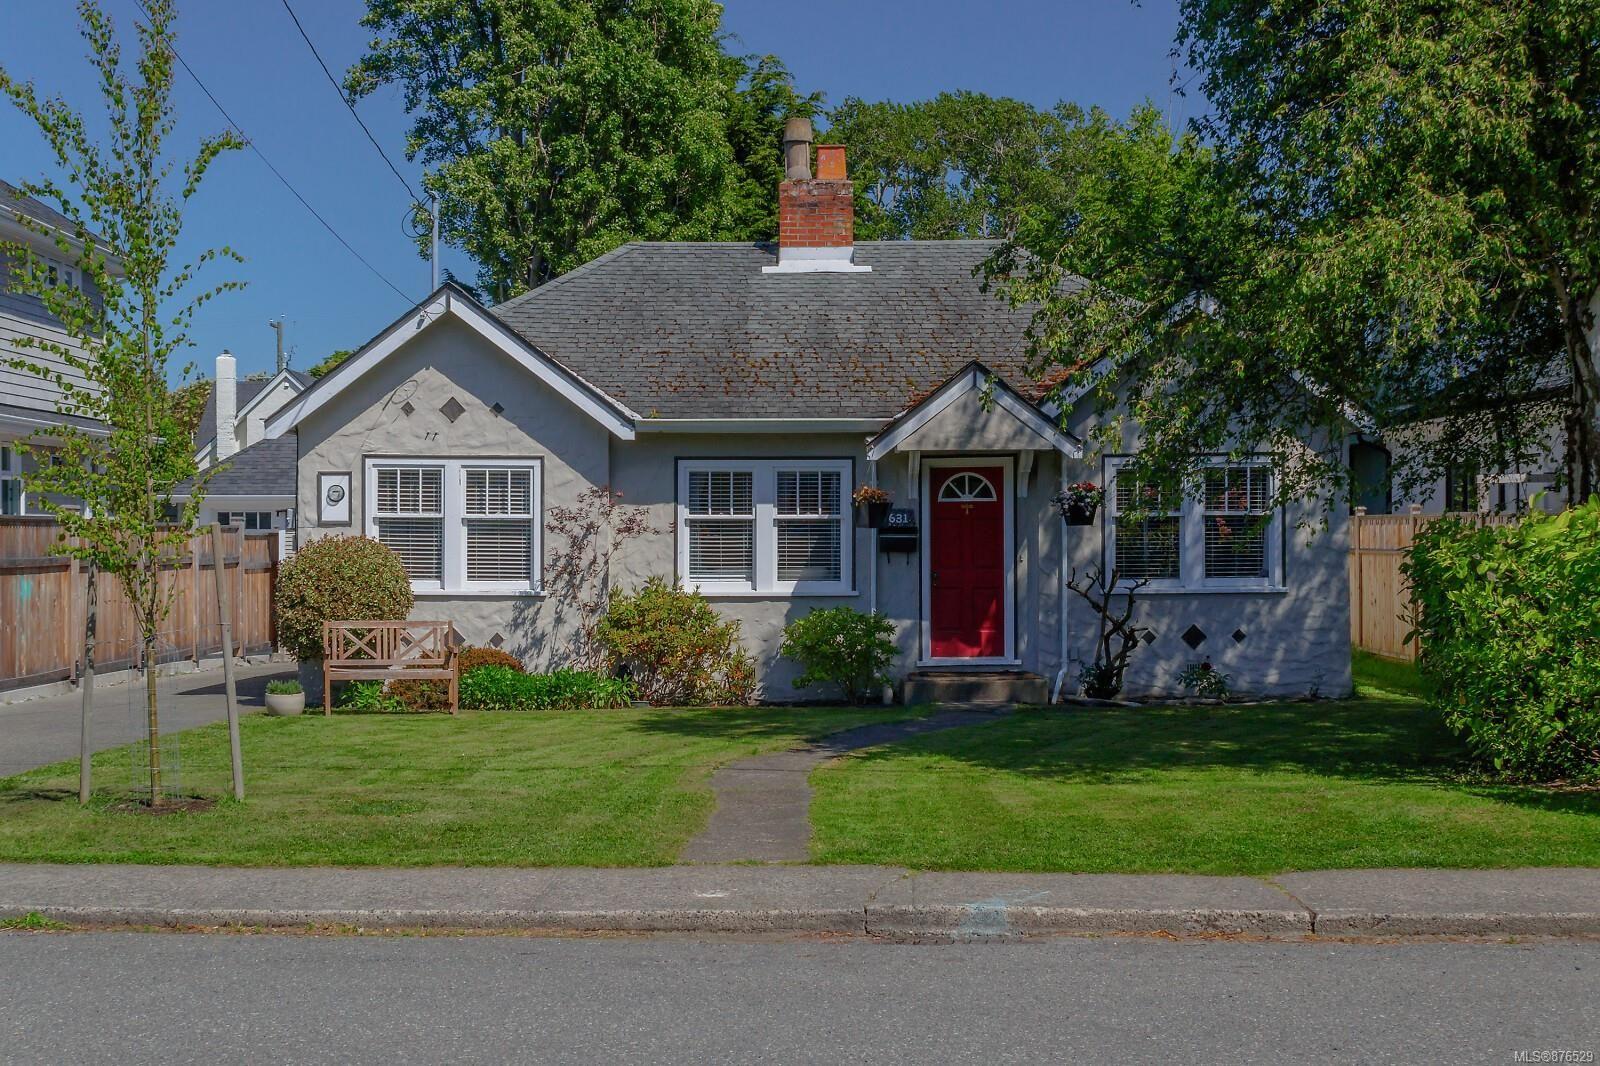 Main Photo: 631 Oliver St in : OB South Oak Bay House for sale (Oak Bay)  : MLS®# 876529